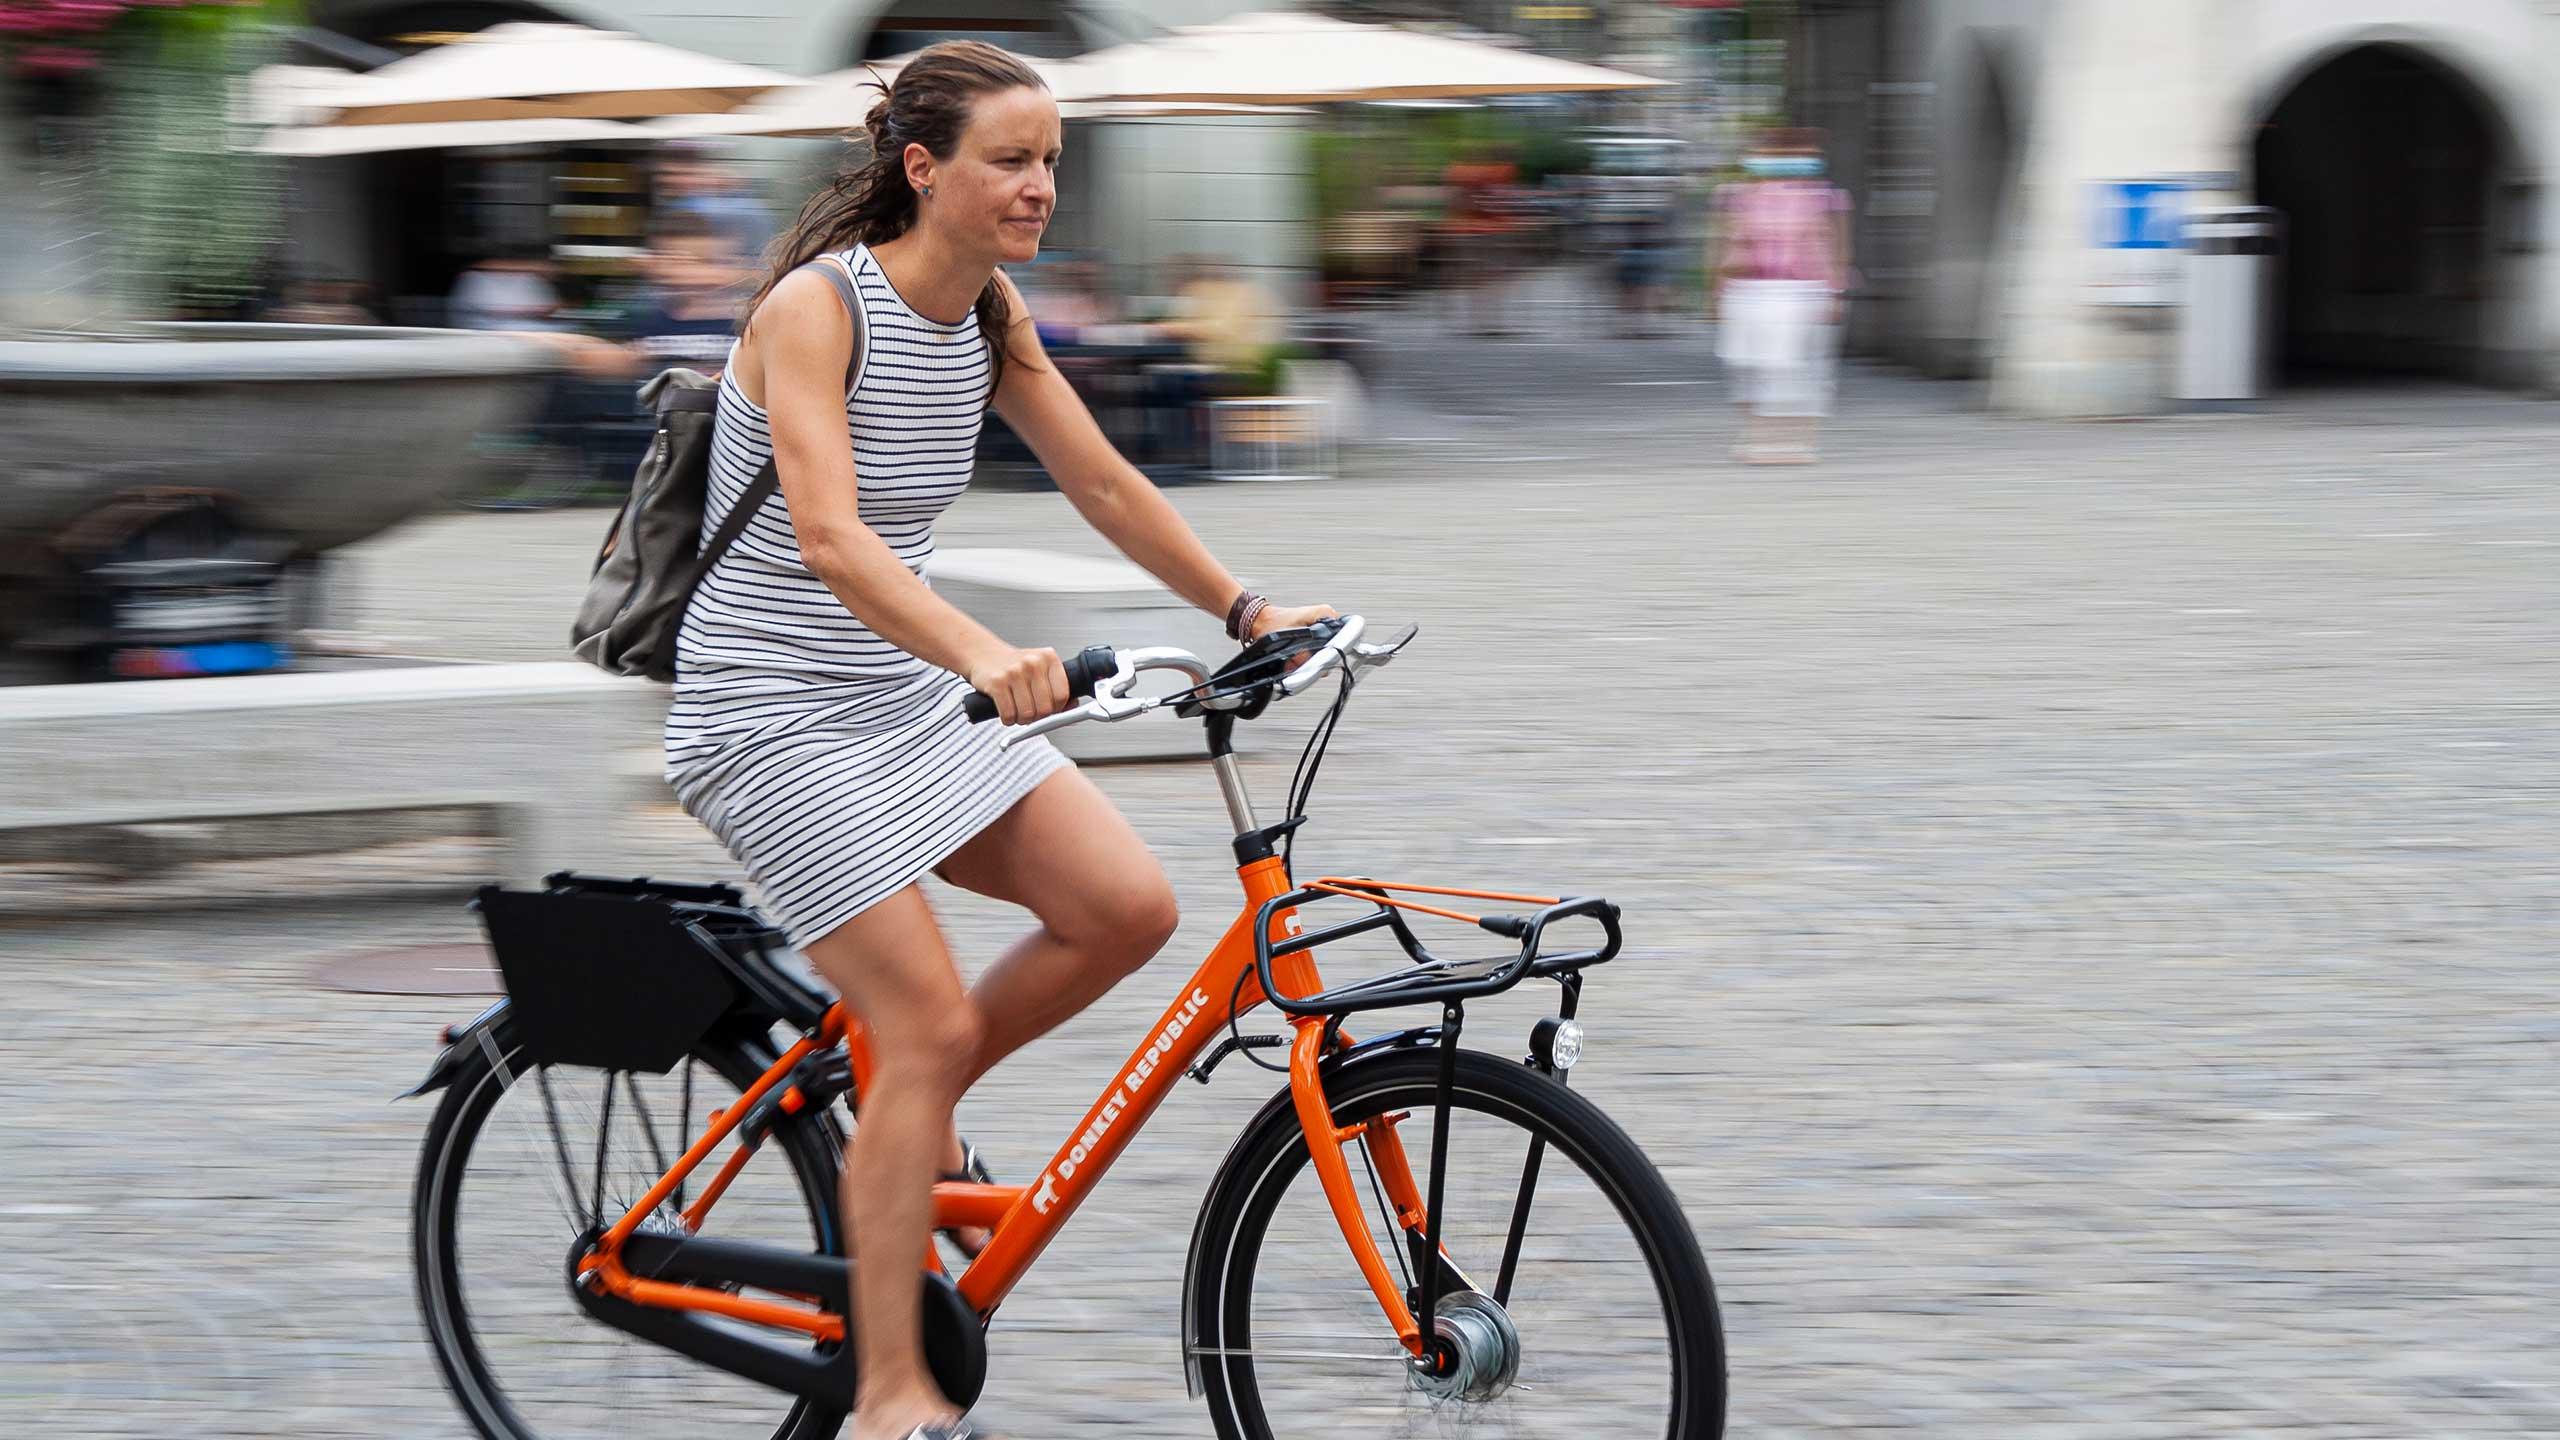 donkey-republic-thun-bike-fahrt-durch-stadt.jpg